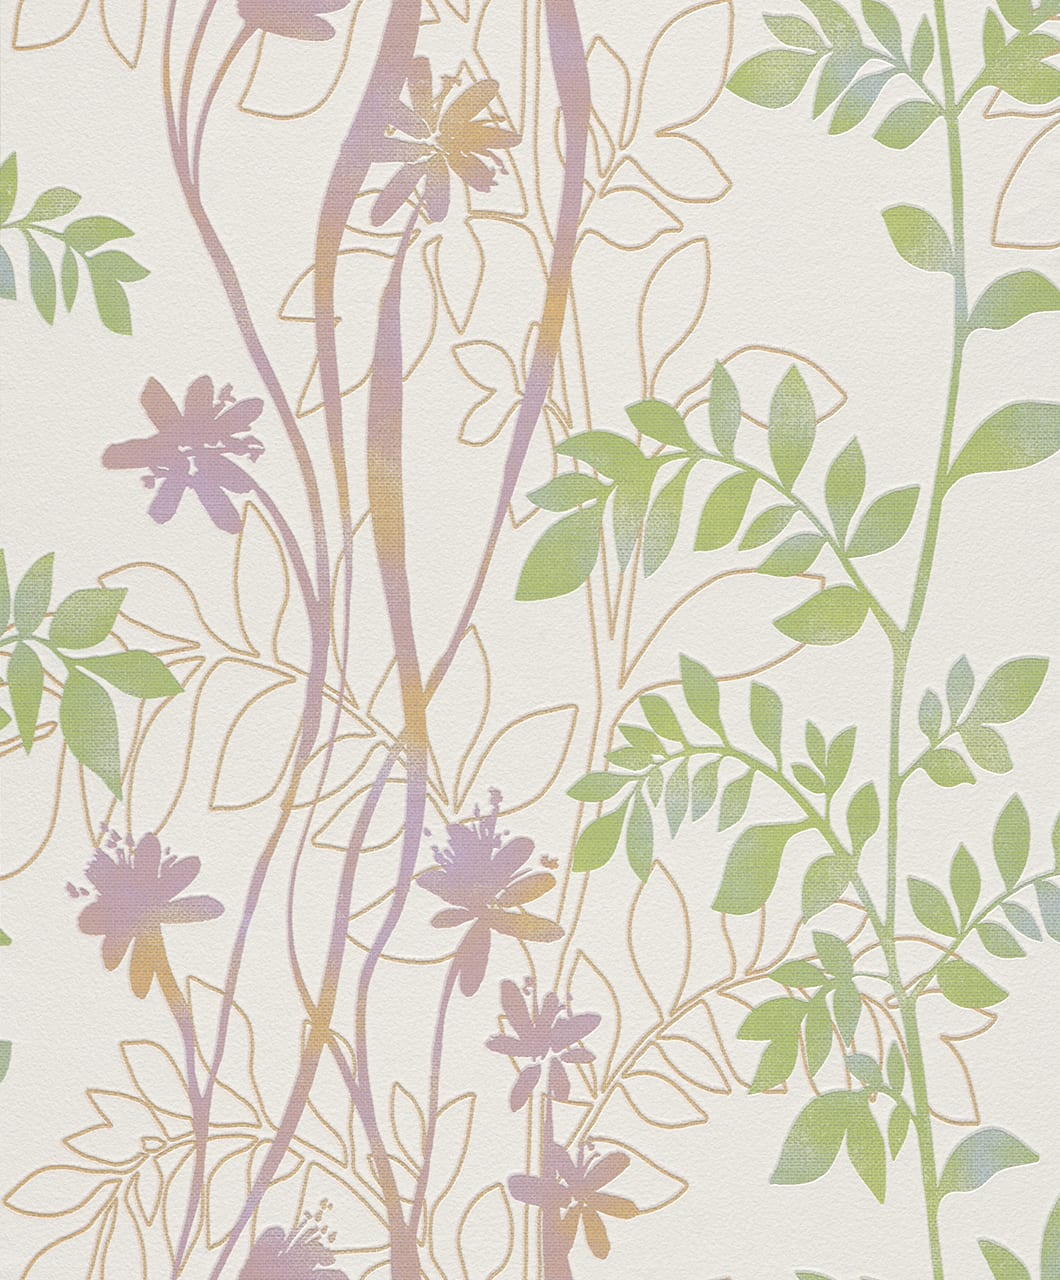 Papel mural Flores y ramas 705188 Rasch